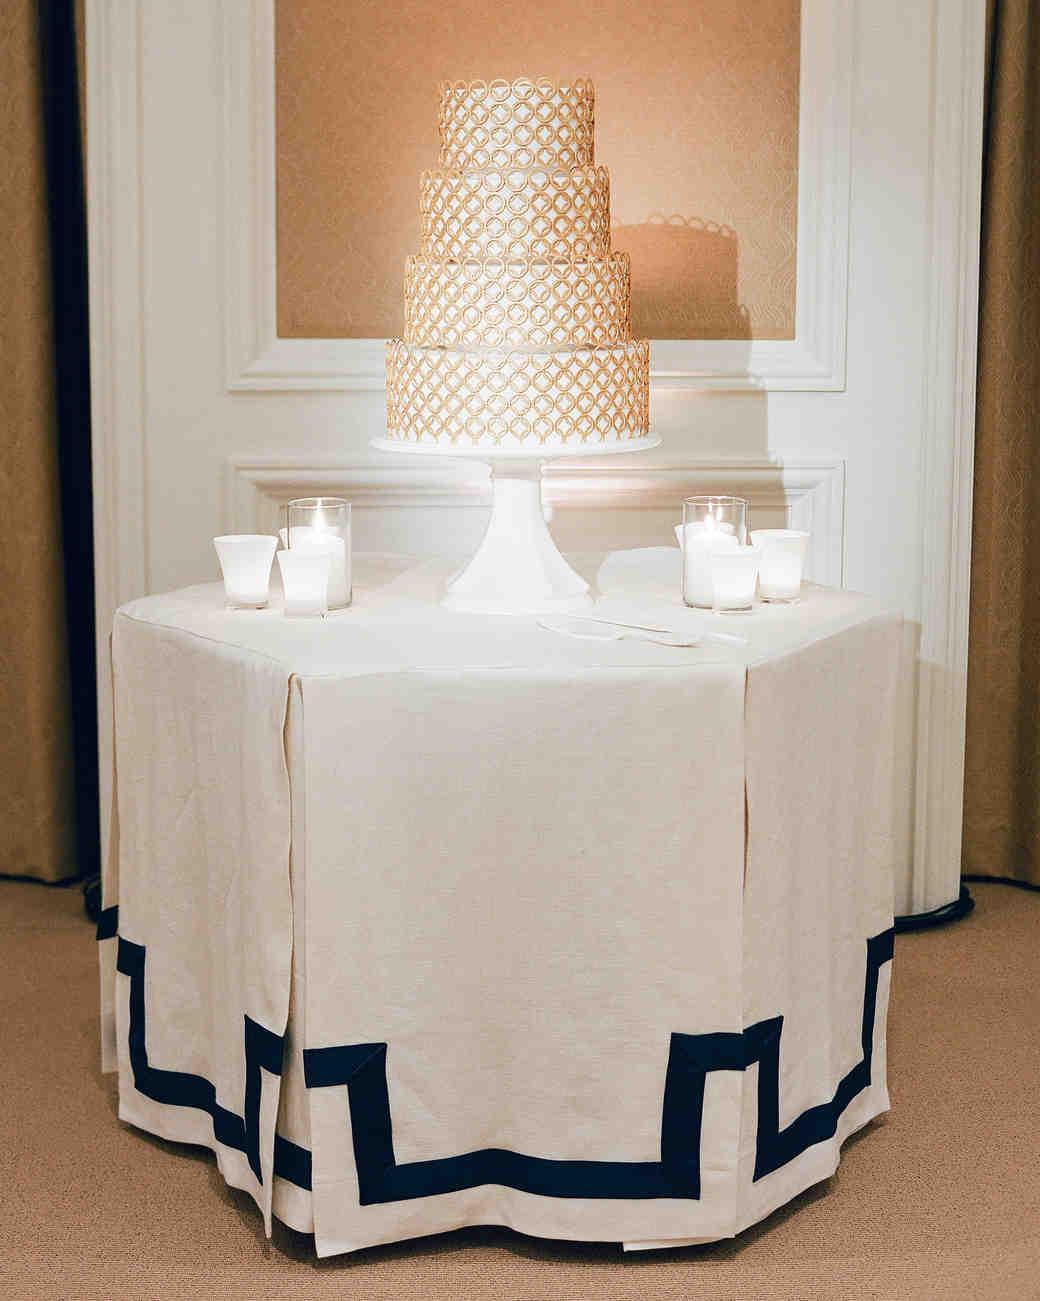 tali-mike-wedding-california-cake-58950005-s112346.jpg